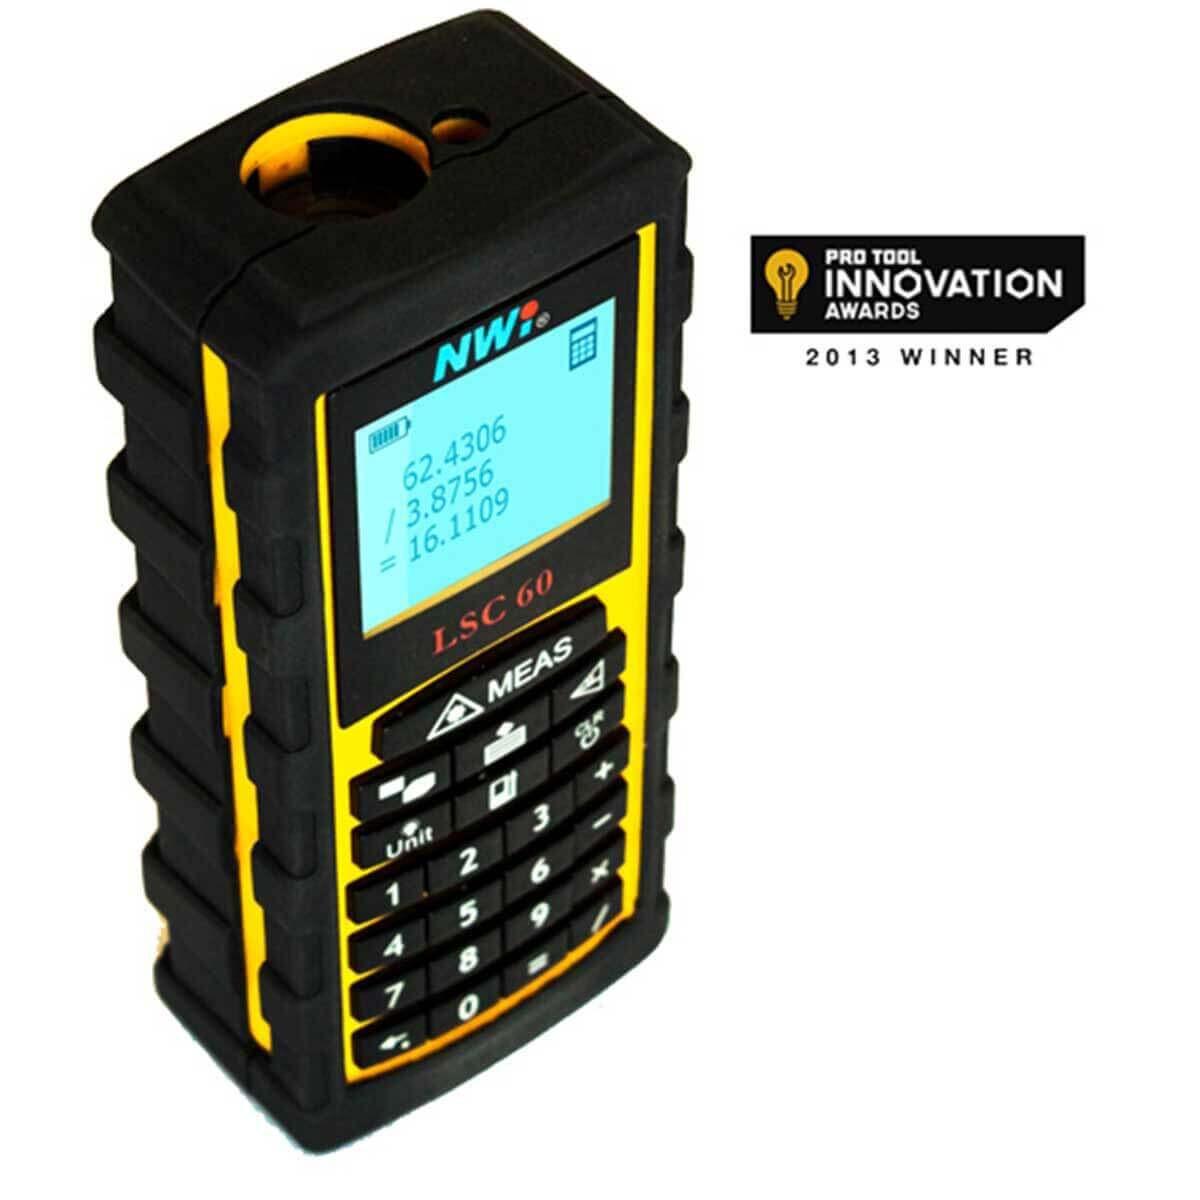 LSC60 Northwest Instruments Laser Distance Measurer